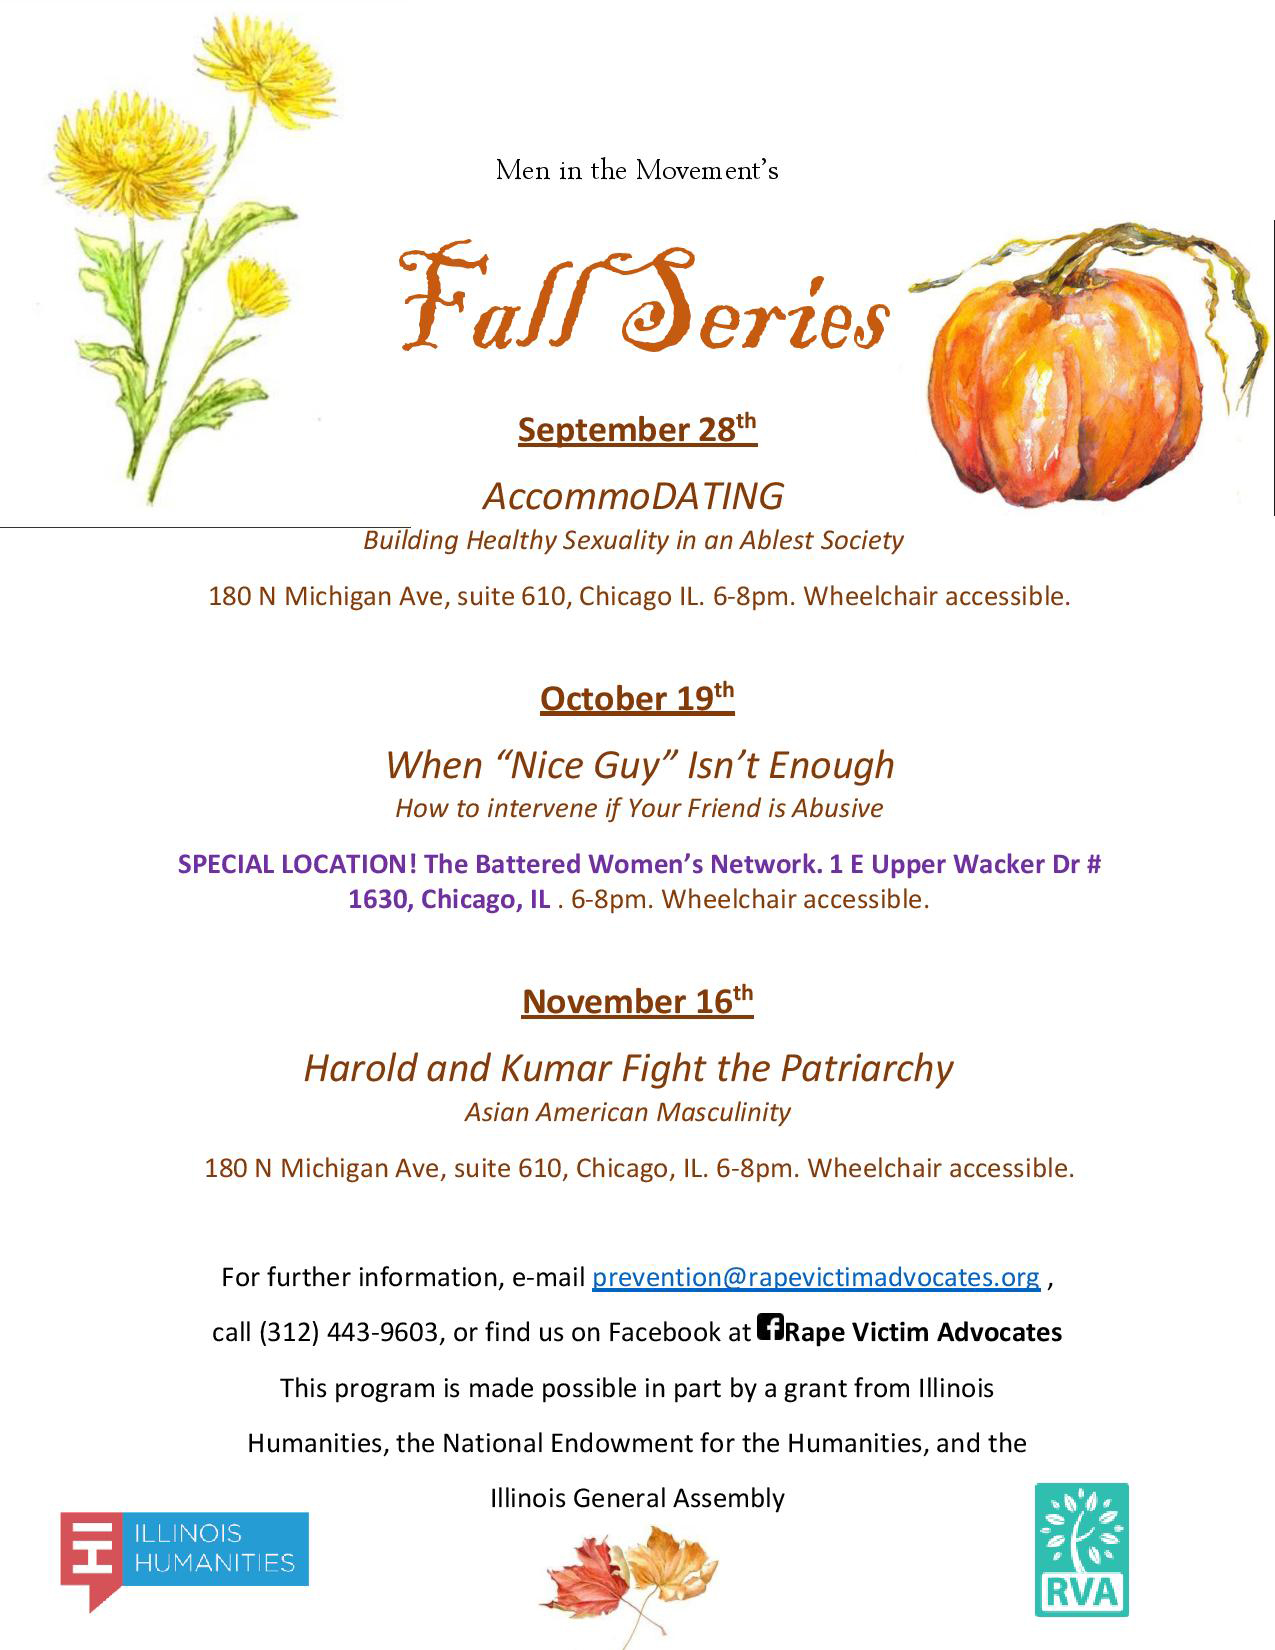 RVA Men in the Movement Fall Series flyer